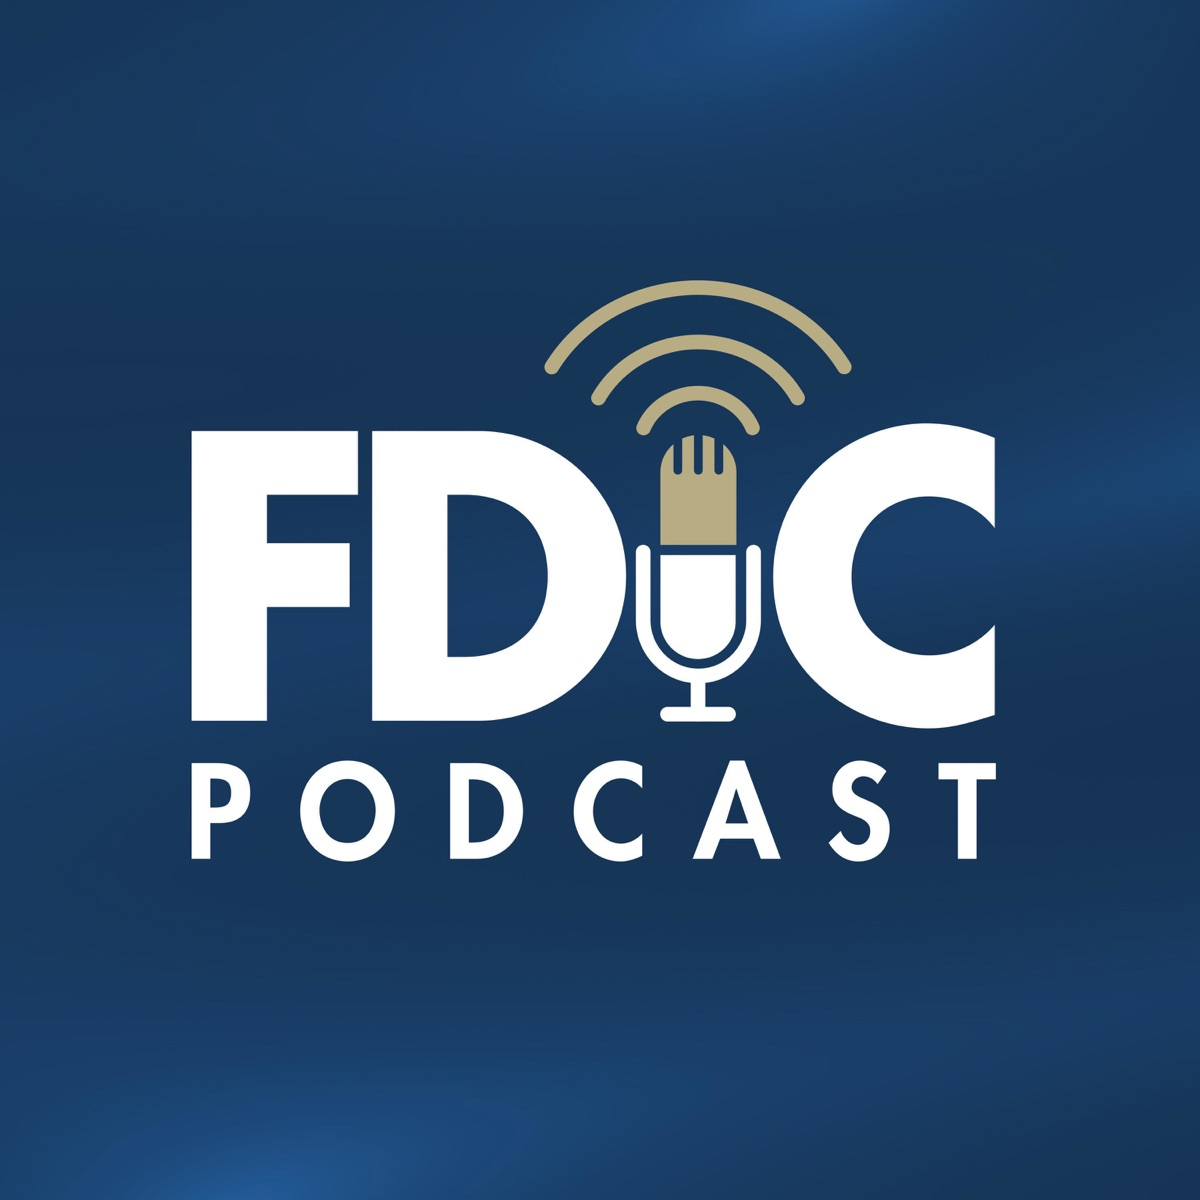 FDIC Podcast